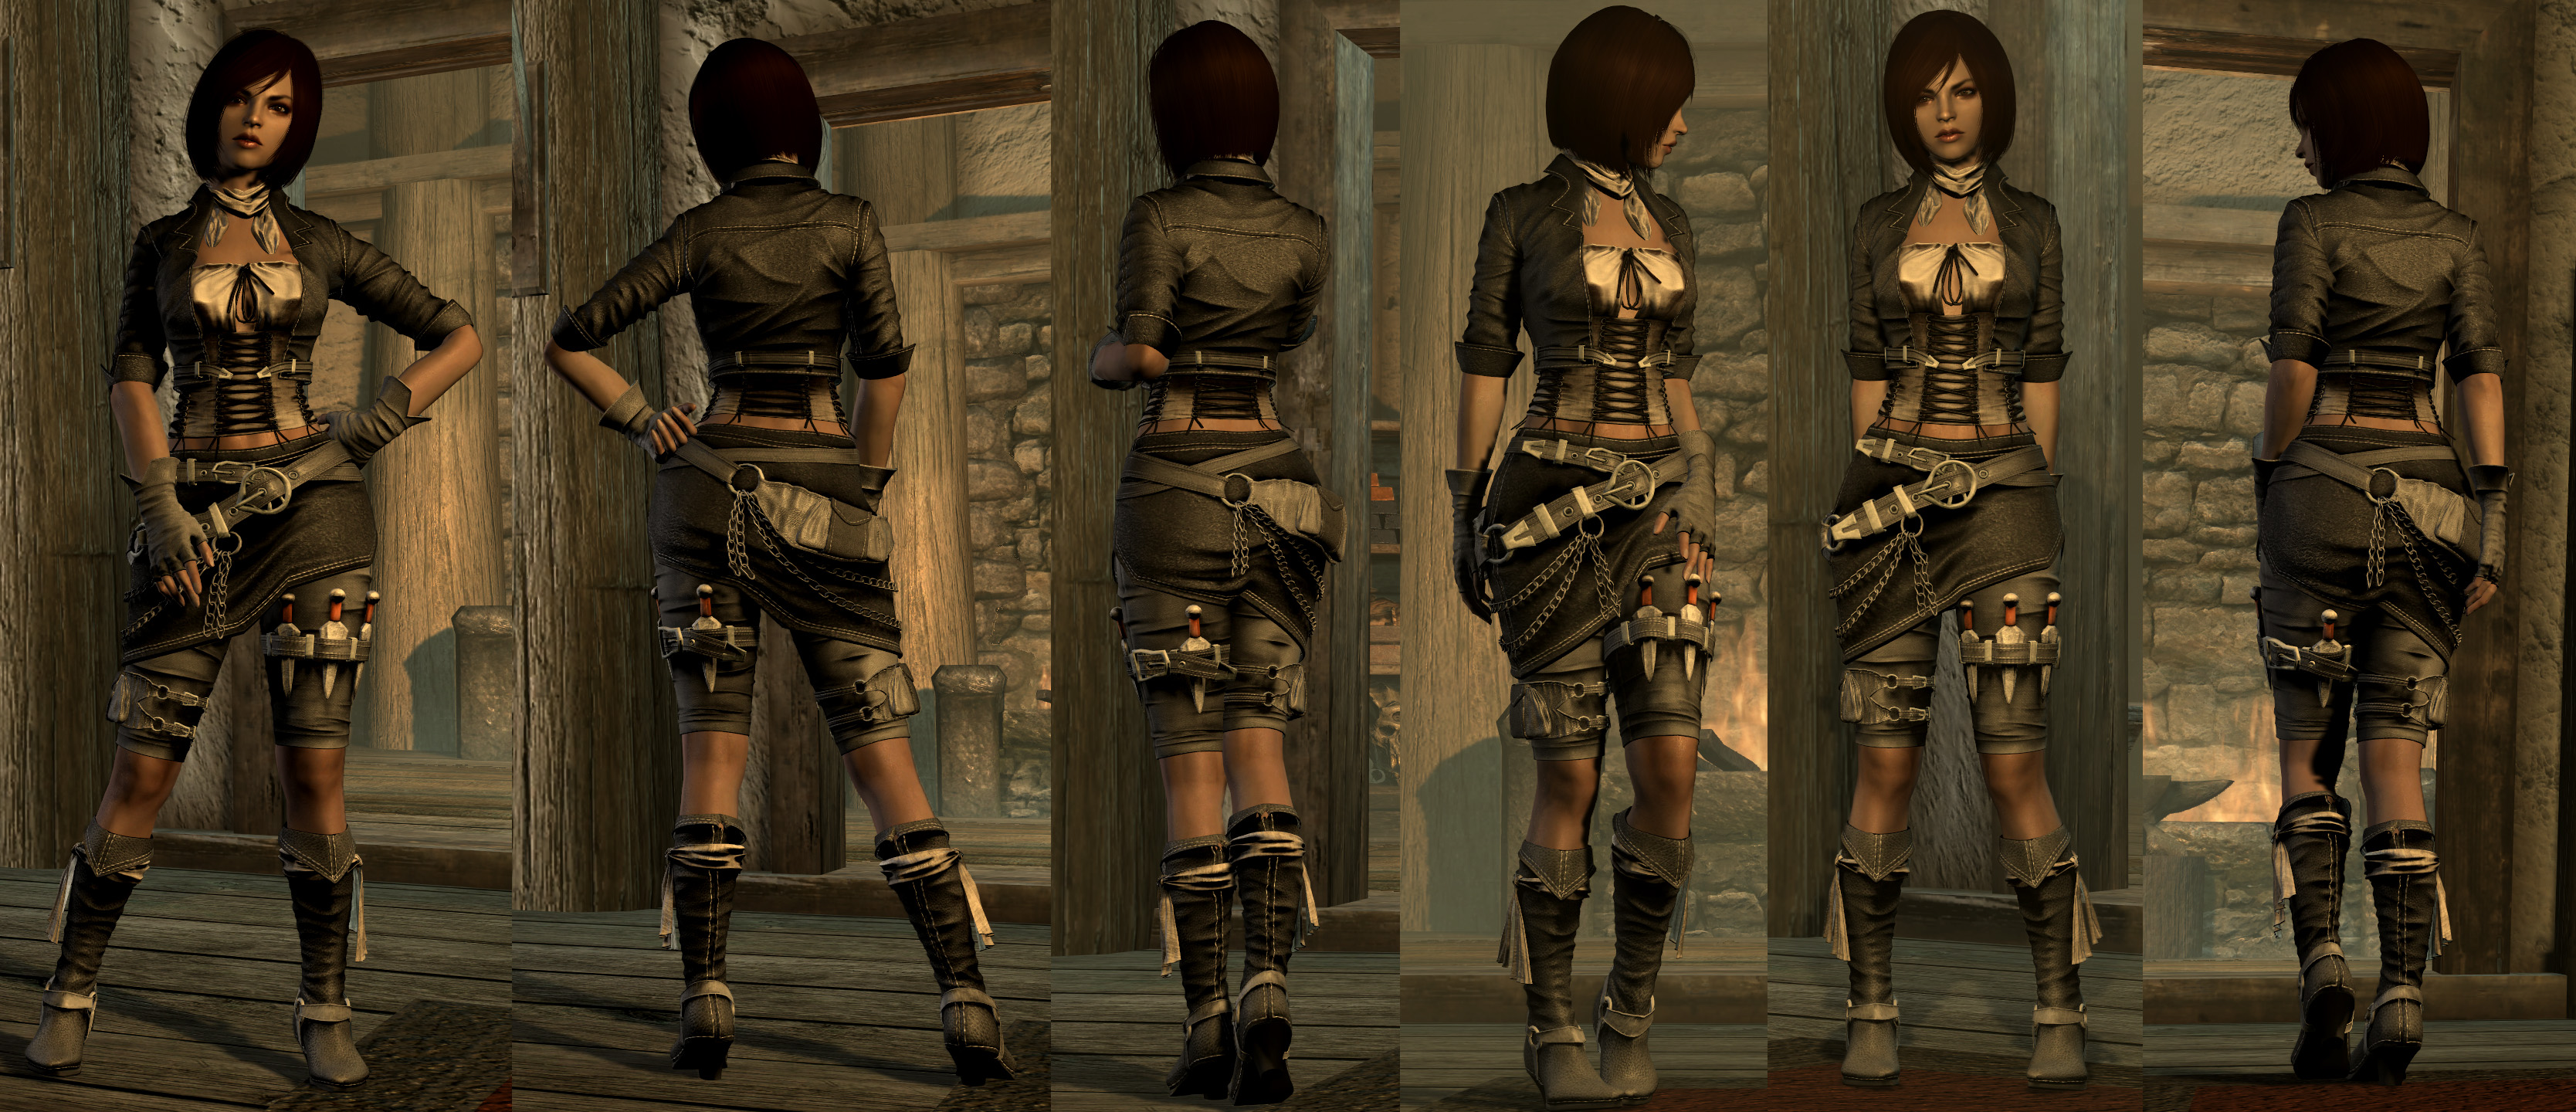 Unp tbbp armor